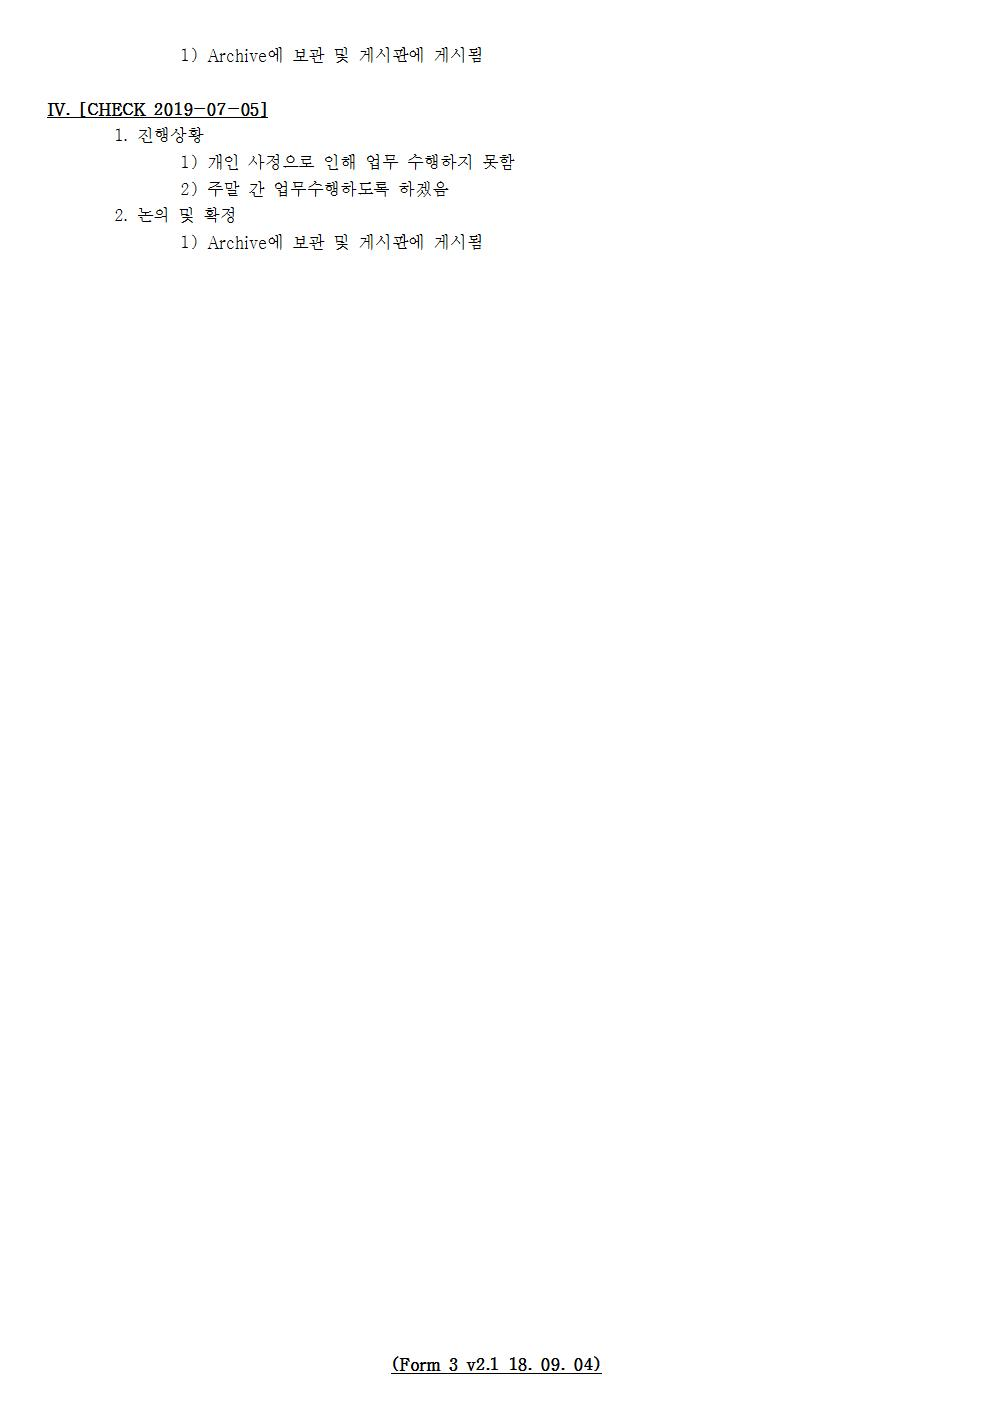 D-[19-001-RD-01]-[SAVE 3.X]-[2019-07-05][SH]-[19-7-1]-[P+D+C]002.jpg